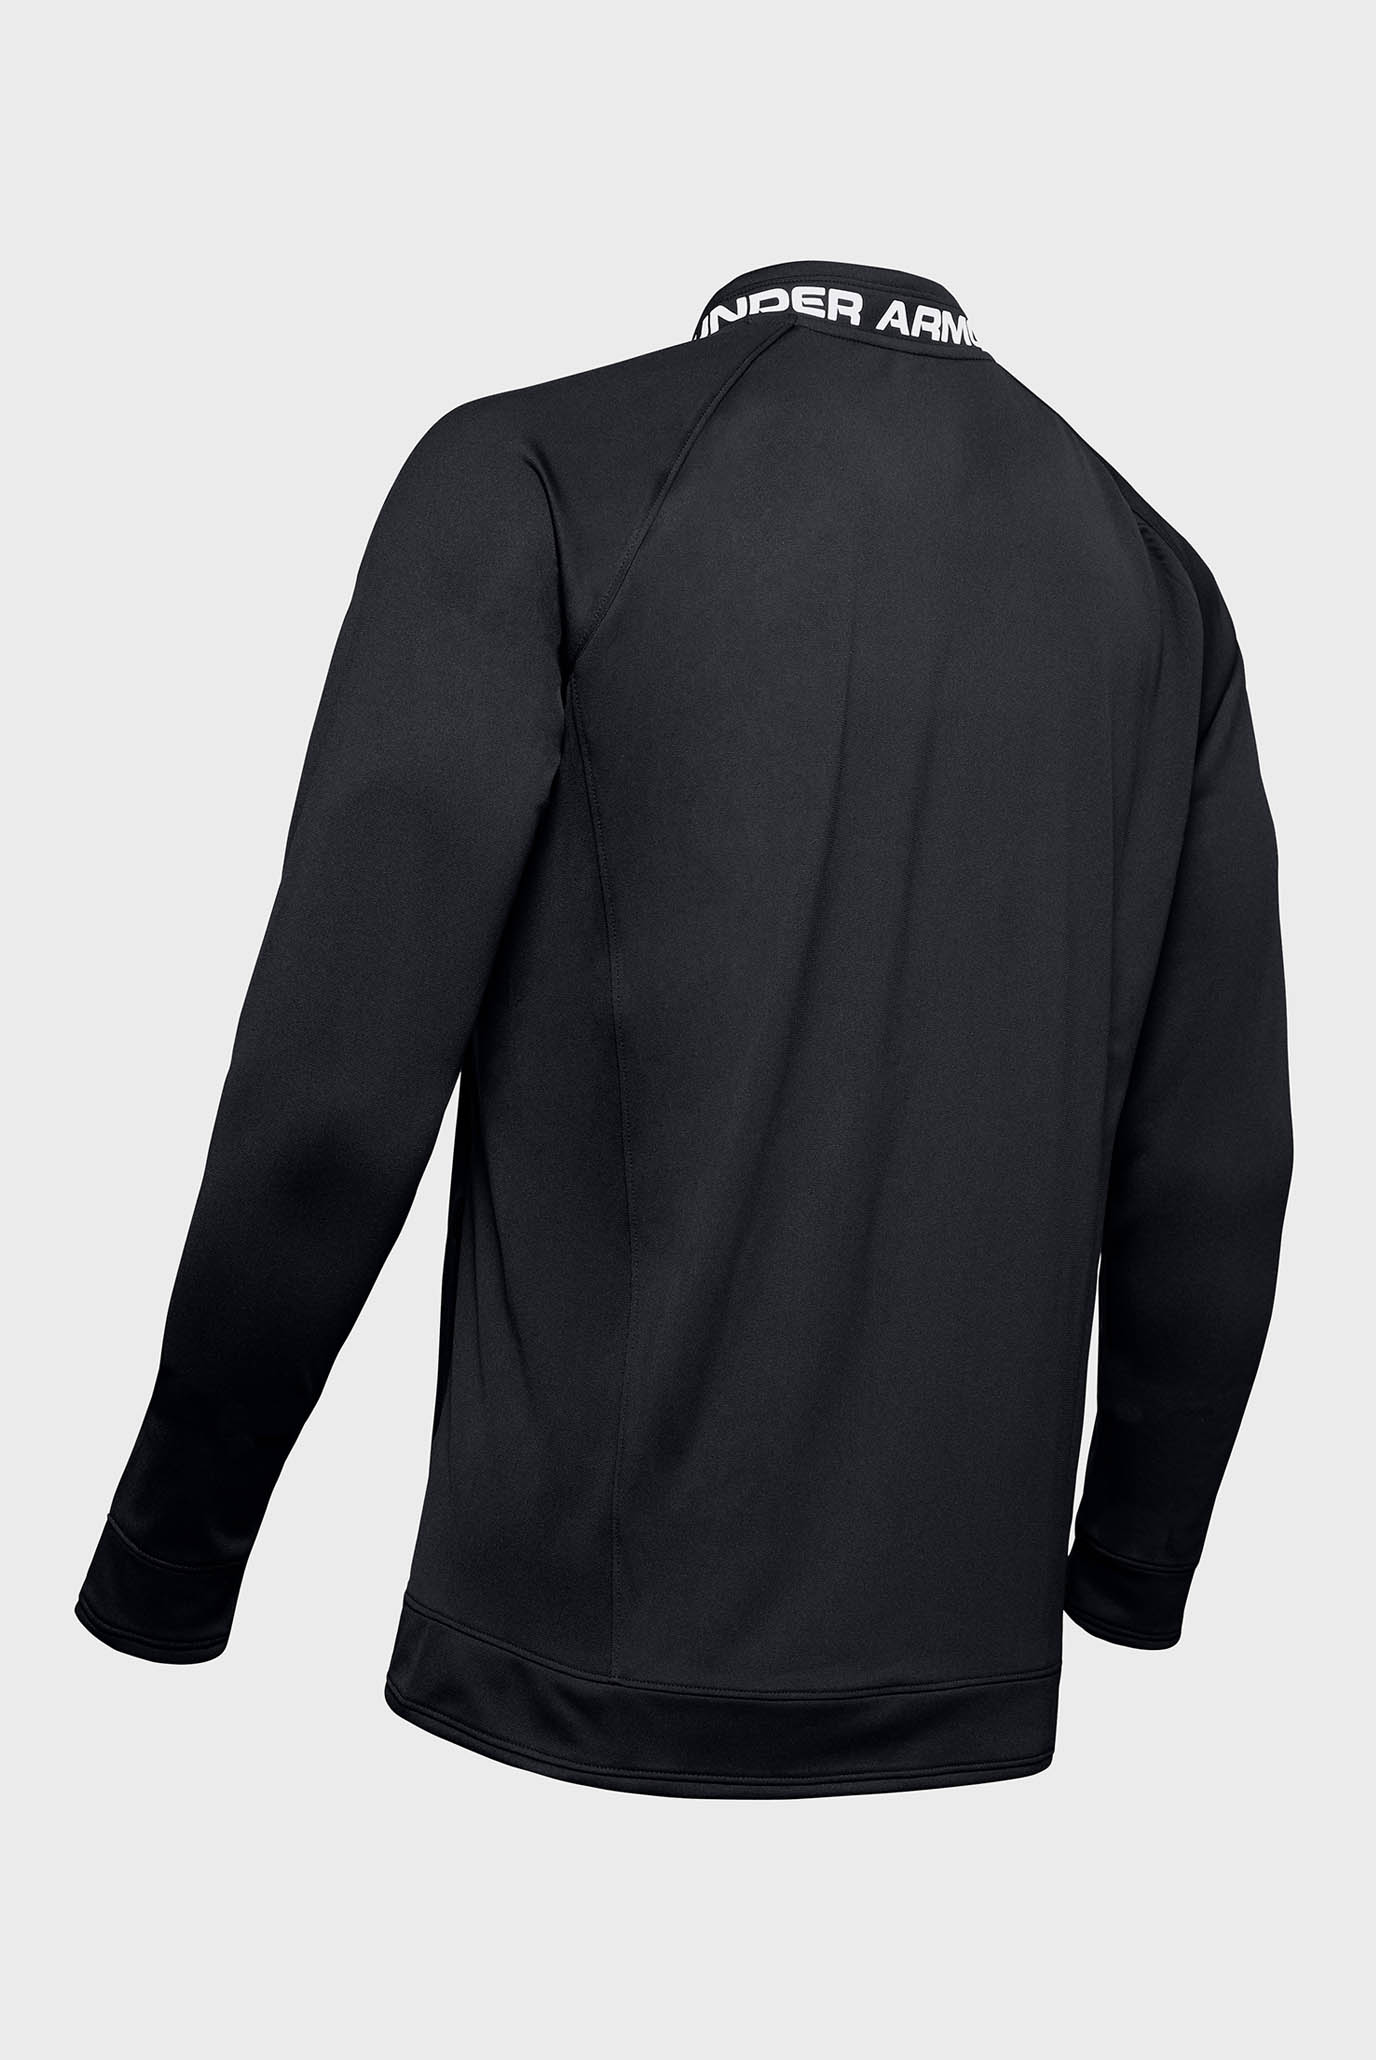 Мужская черная спортивная кофта Challenger III Jacket Under Armour